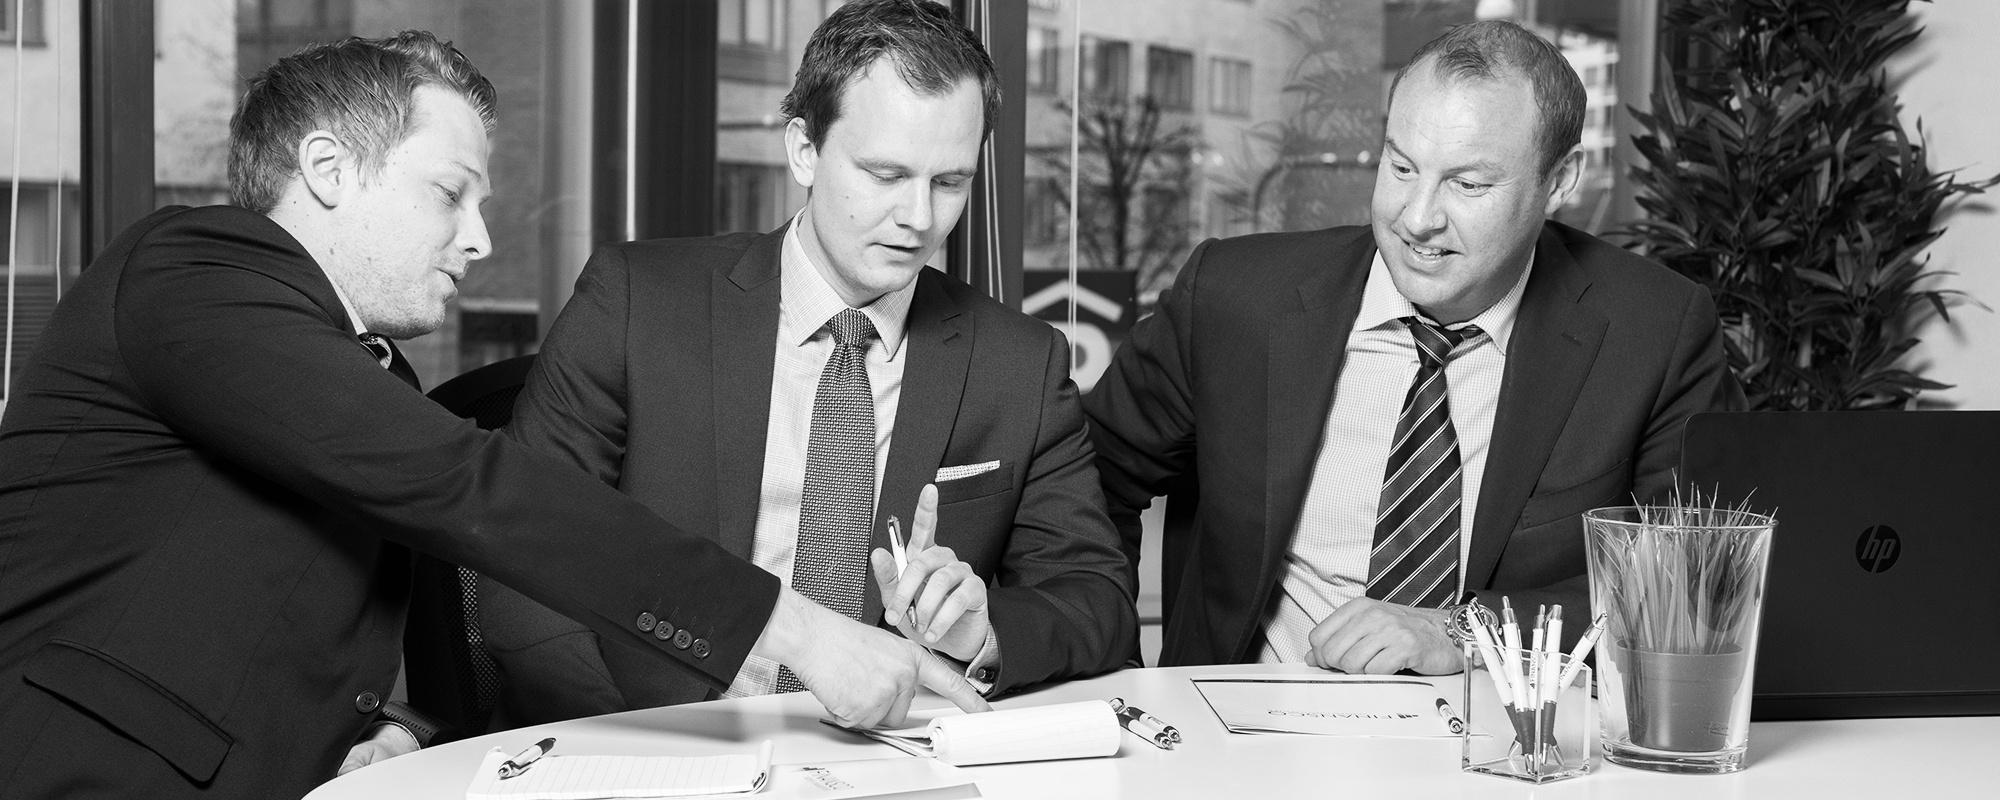 hva er investeringsrådgivning?